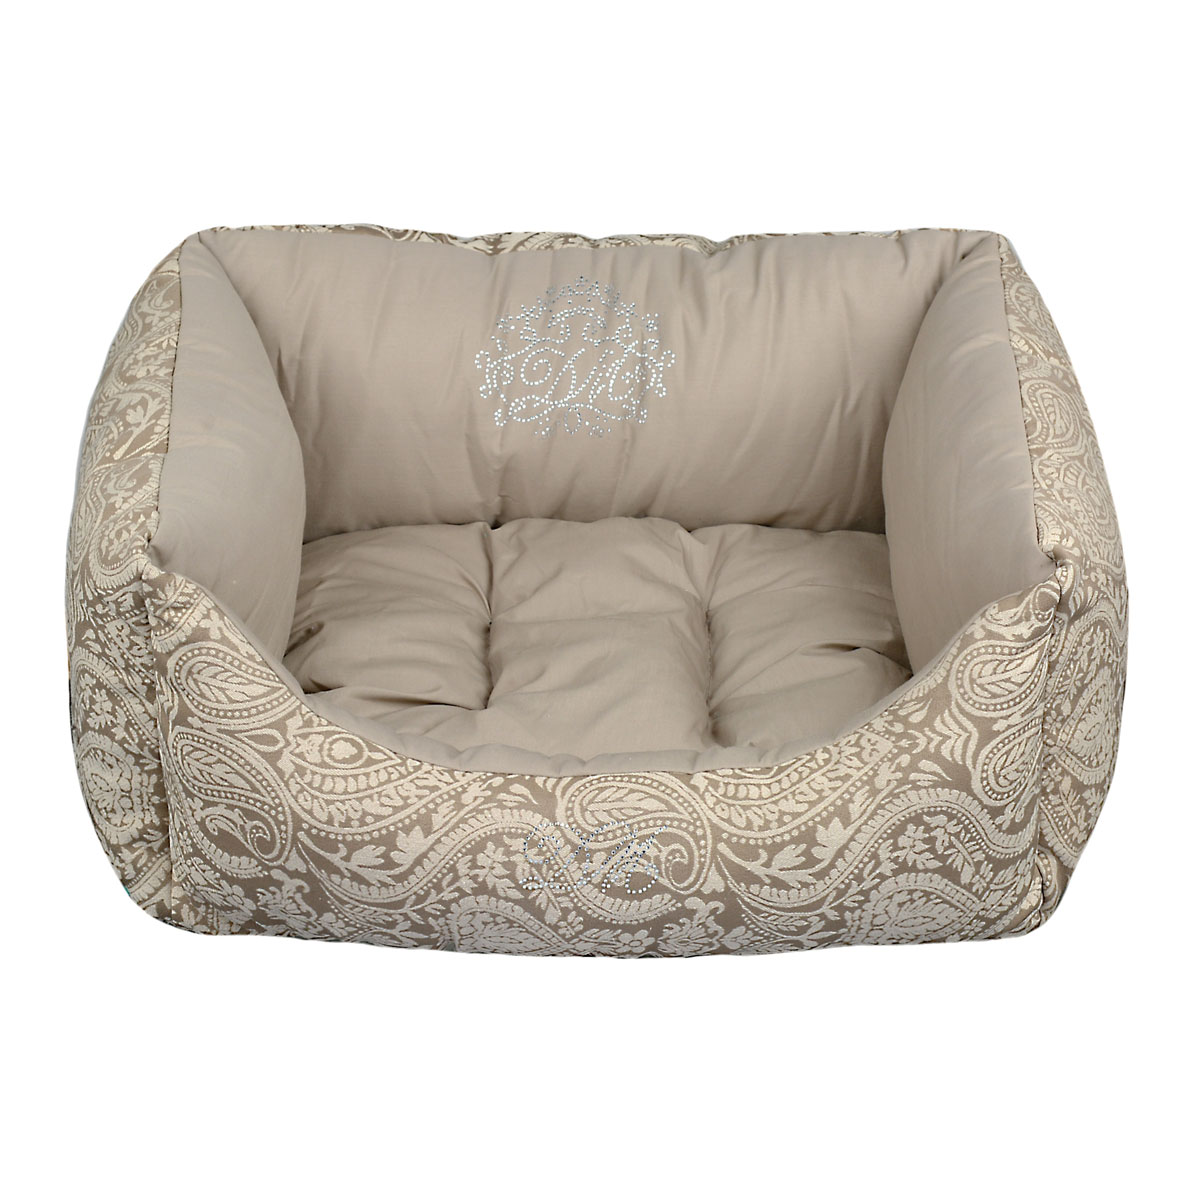 Лежак для животных Dogmoda Элегант, 27 х 32 х 13 см лежак дарэлл хантер лось 1 с подушкой 45 33 14см